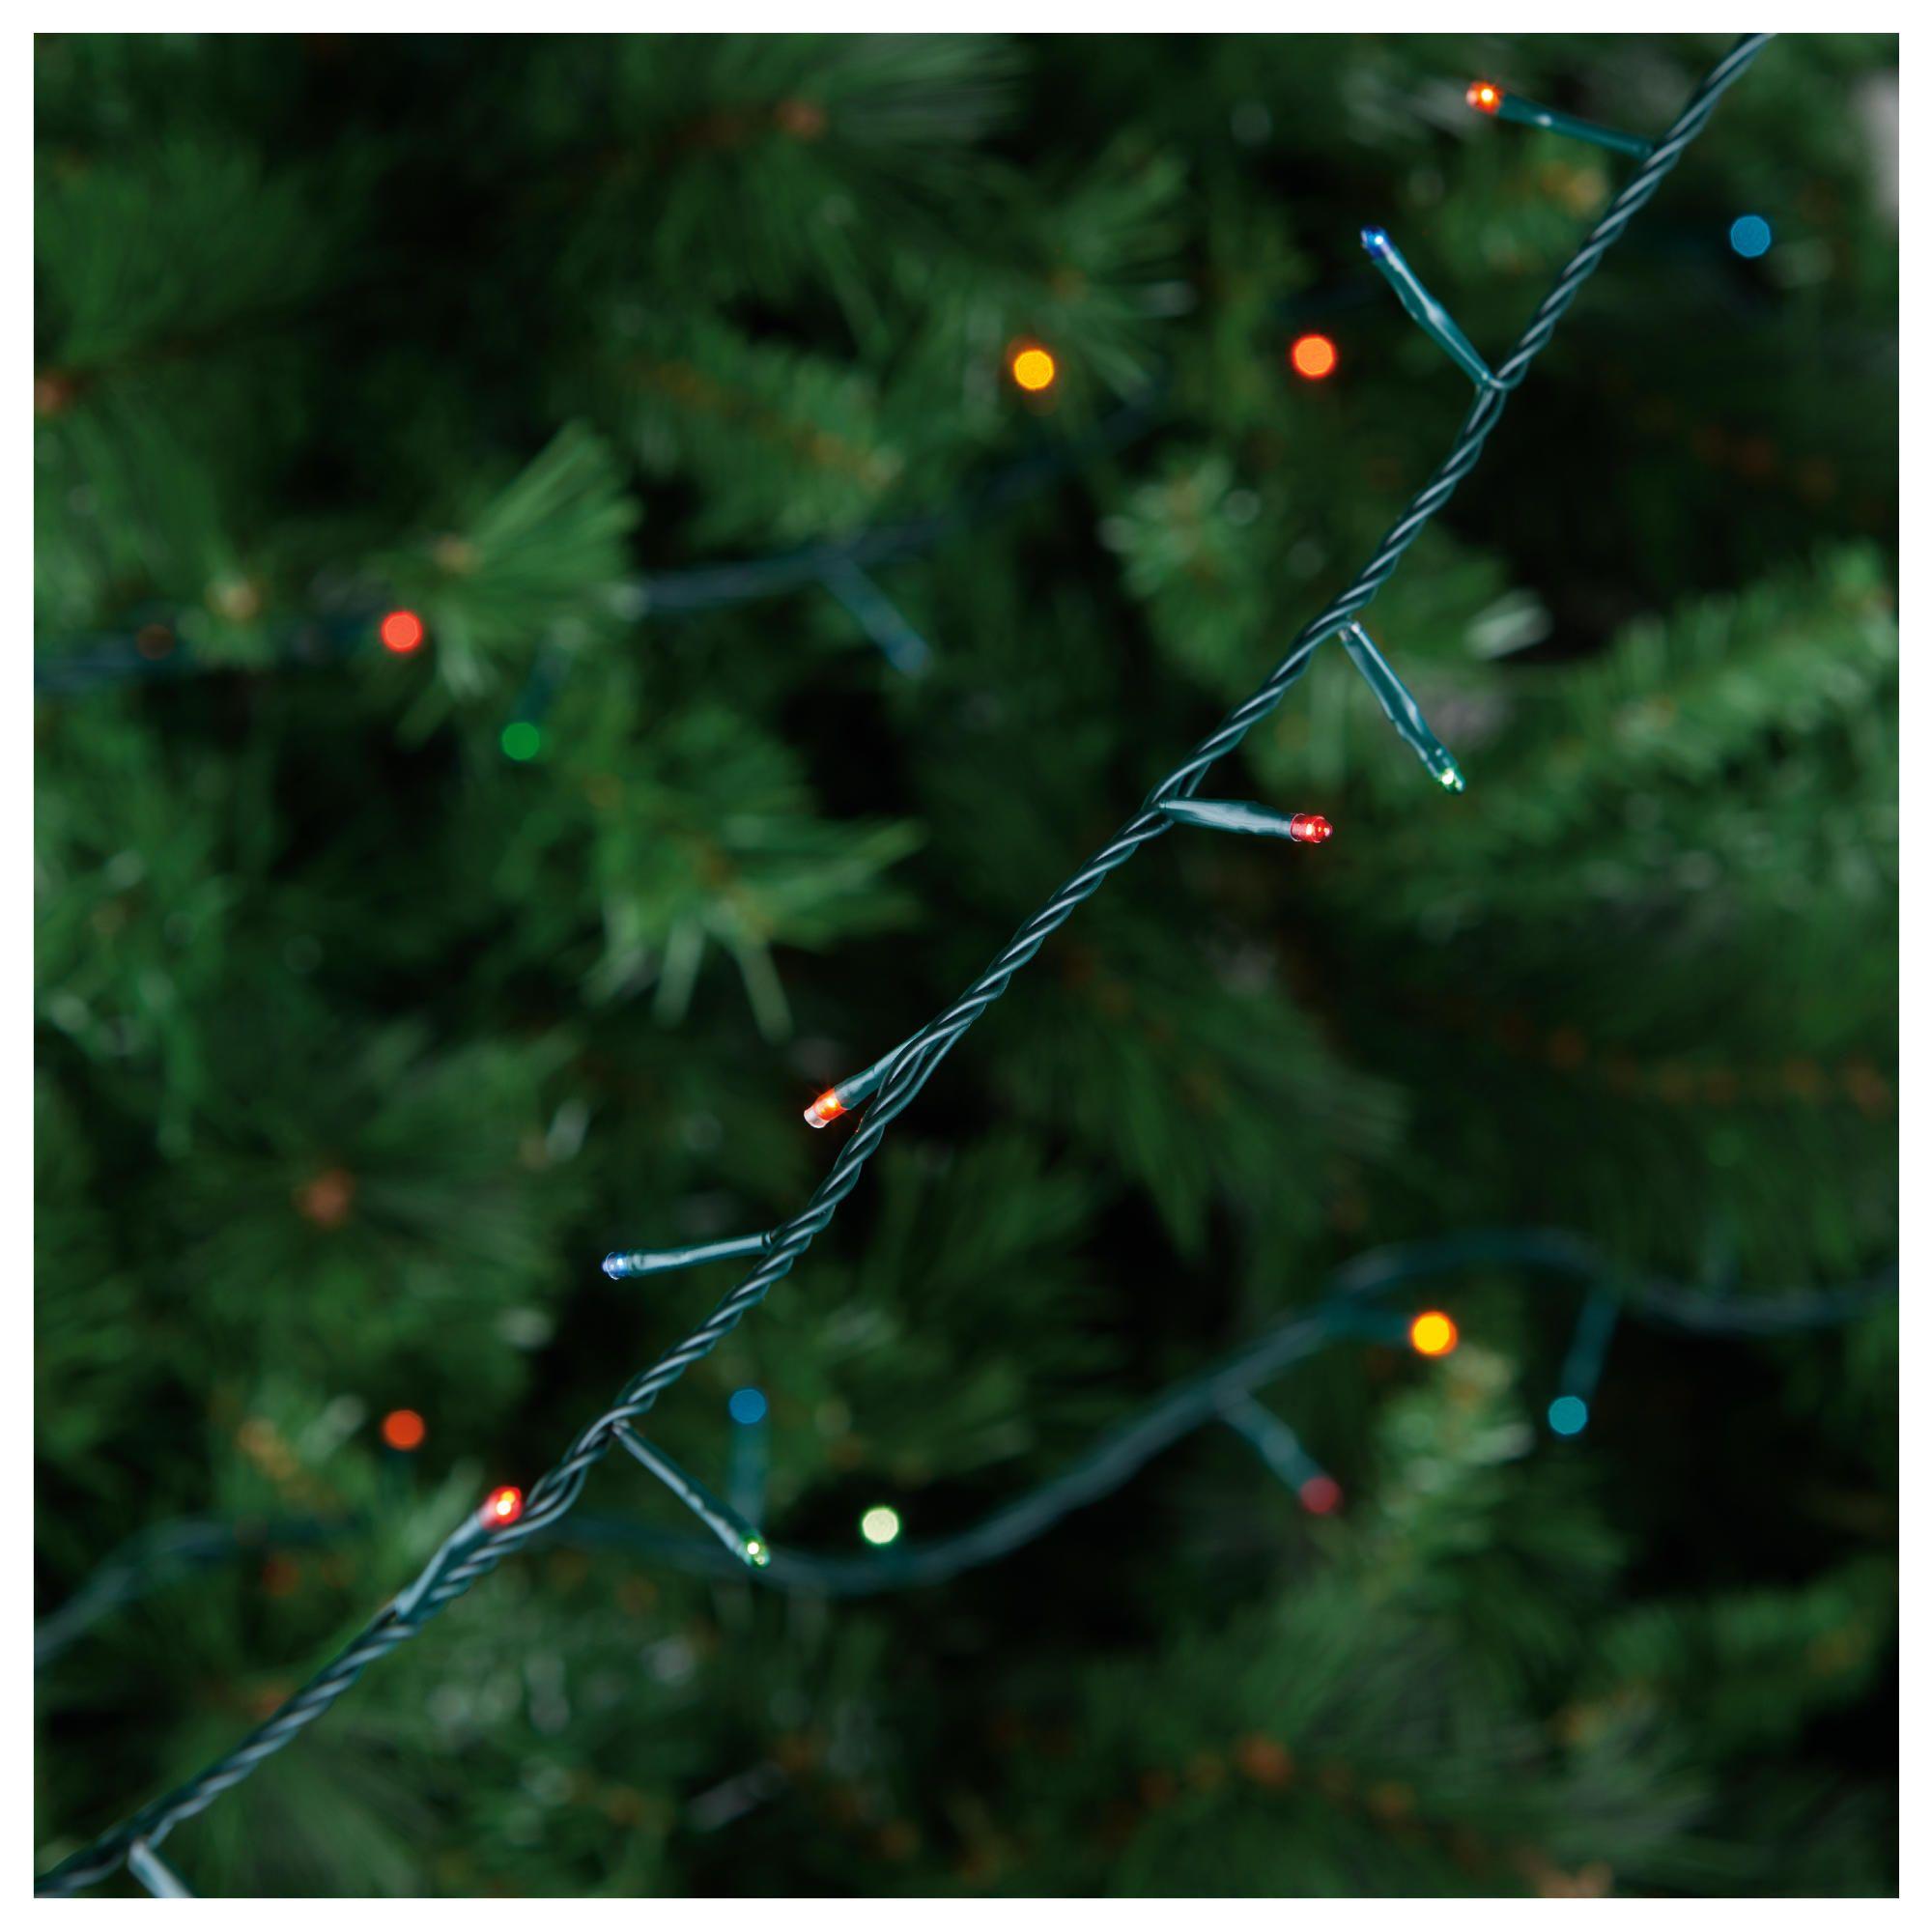 Led String Lights Tesco : Myshop